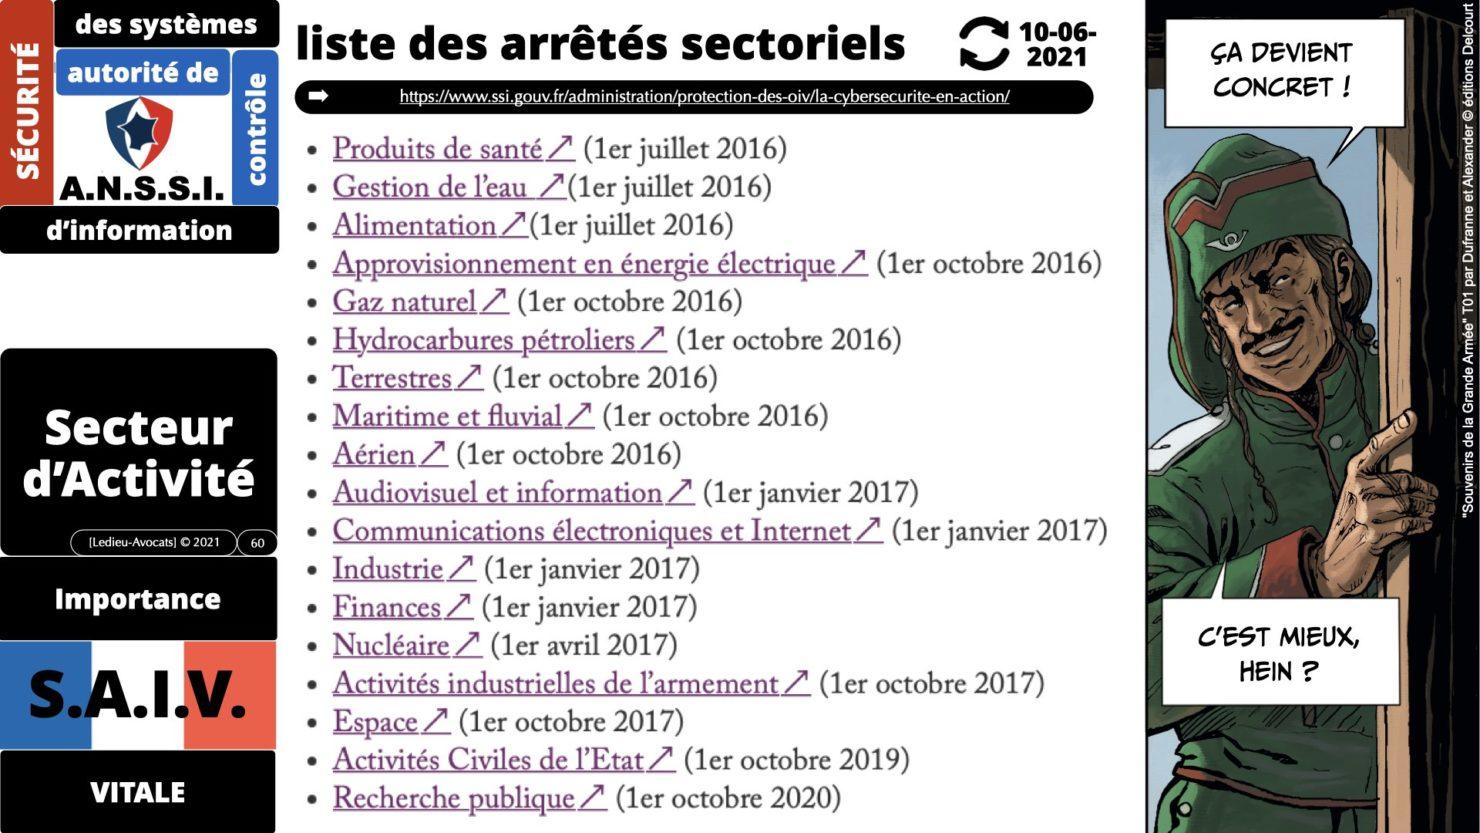 337 cyber sécurité #1 OIV OSE Critical Entities © Ledieu-avocat 15-06-2021.060